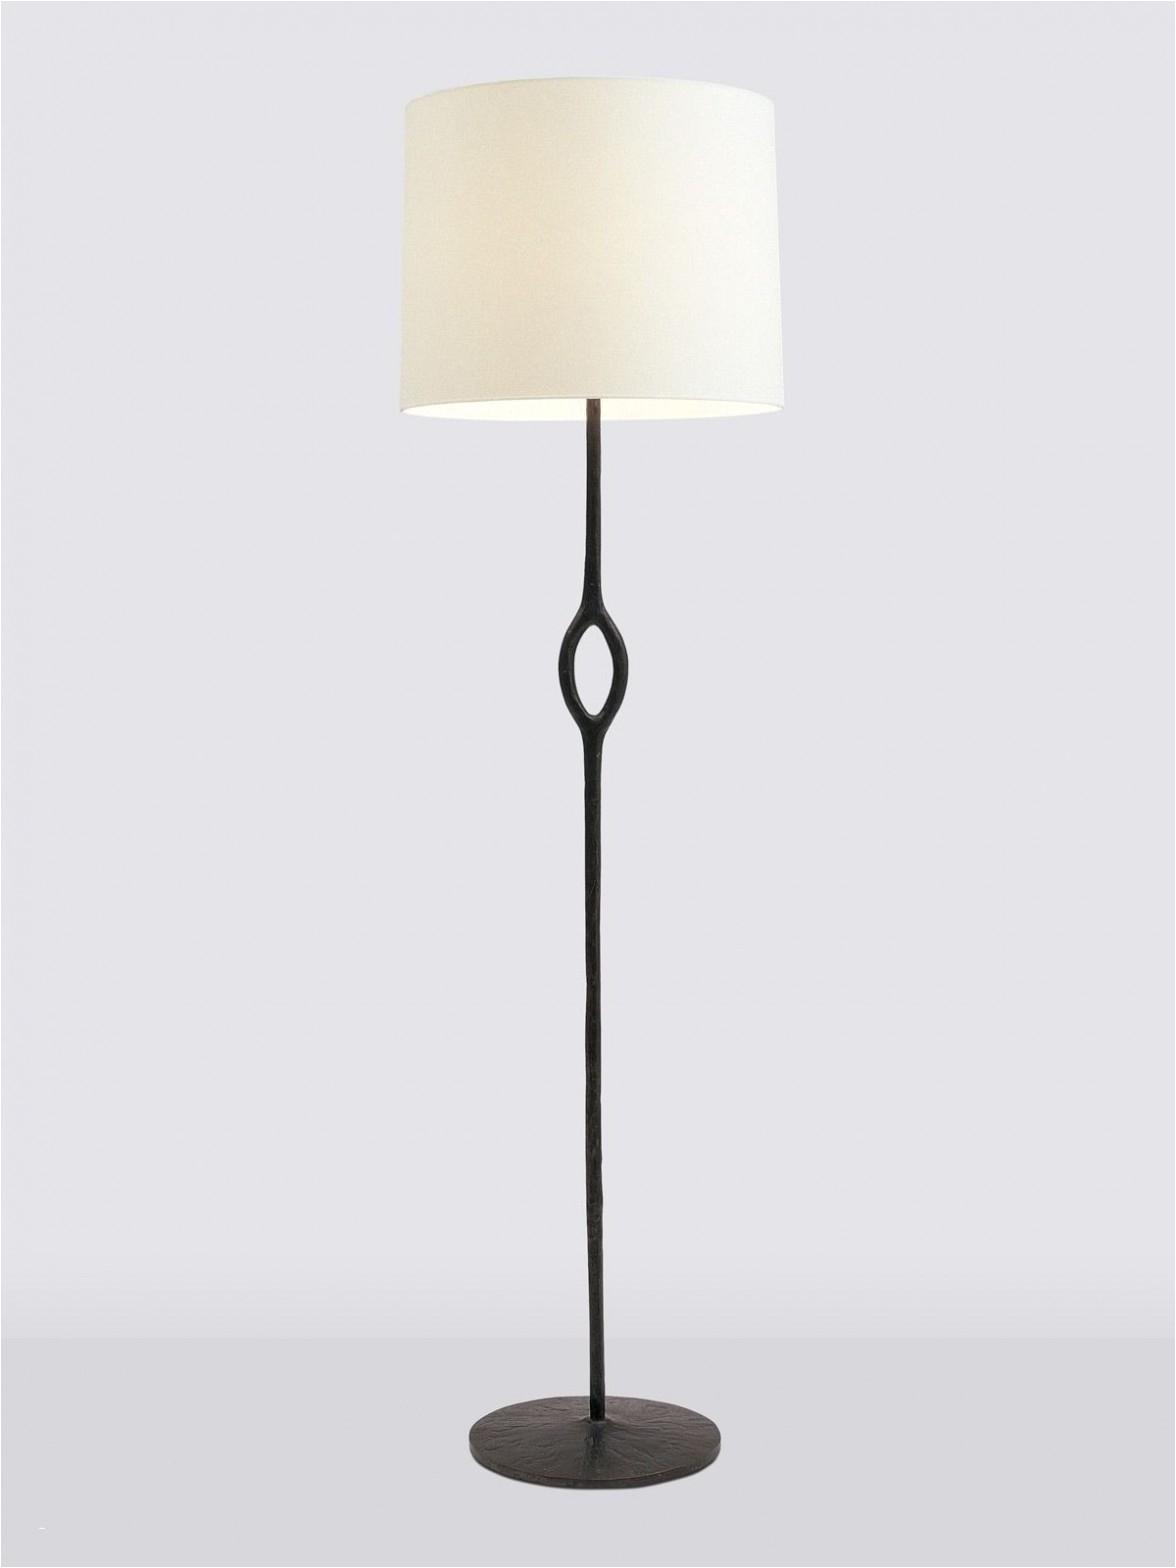 31 beautiful reading lamps walmart